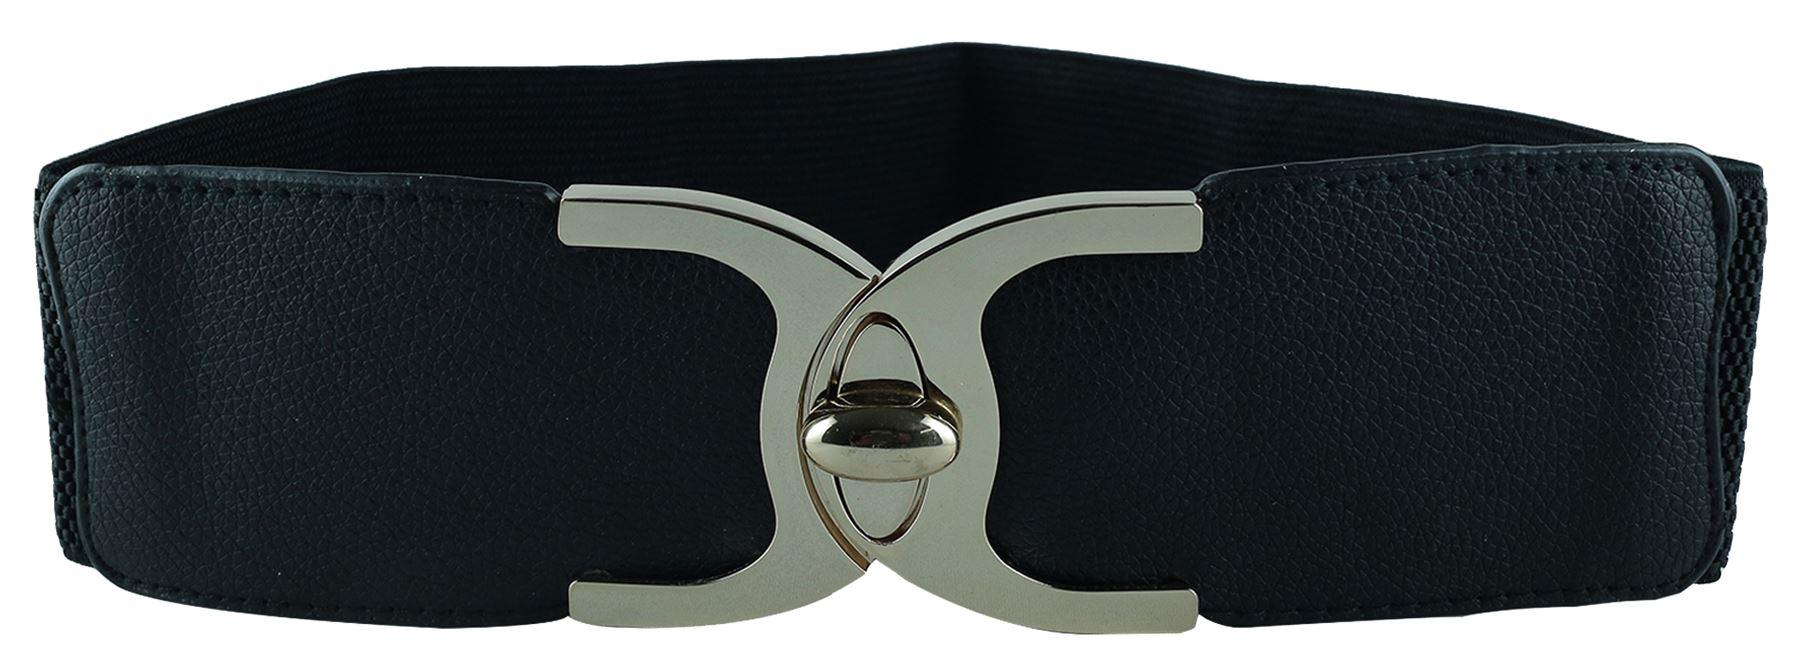 Ladies-Metal-Twist-Turn-Lock-Closure-Elasticated-Wide-Stretch-Cinch-Waist-Belts